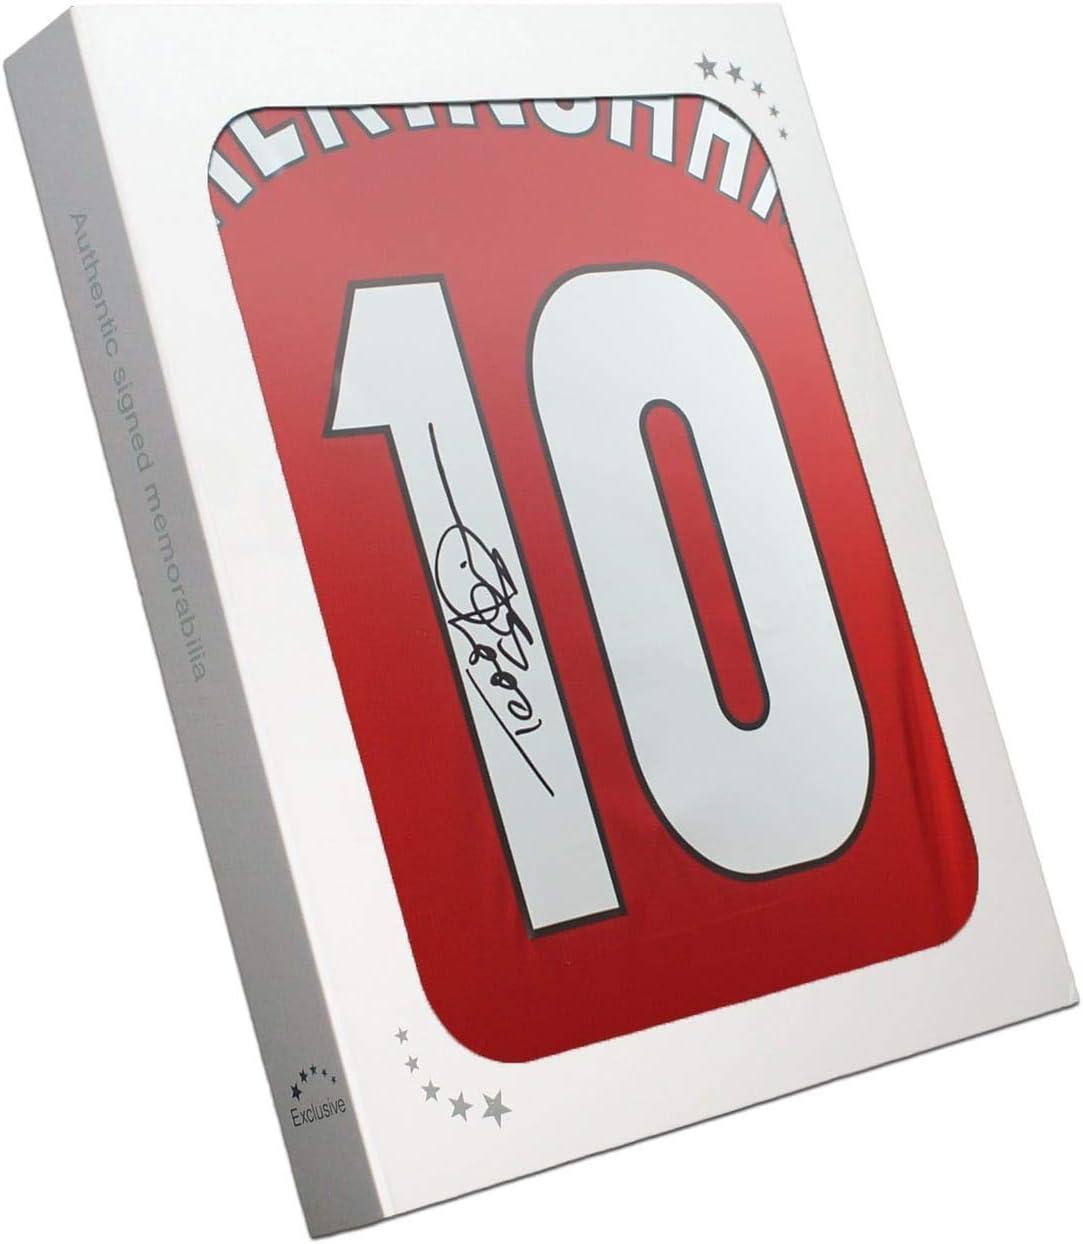 Exclusive Memorabilia Maillot Manchester United sign/é par Teddy Sheringham et Ole Gunnar Solskjaer